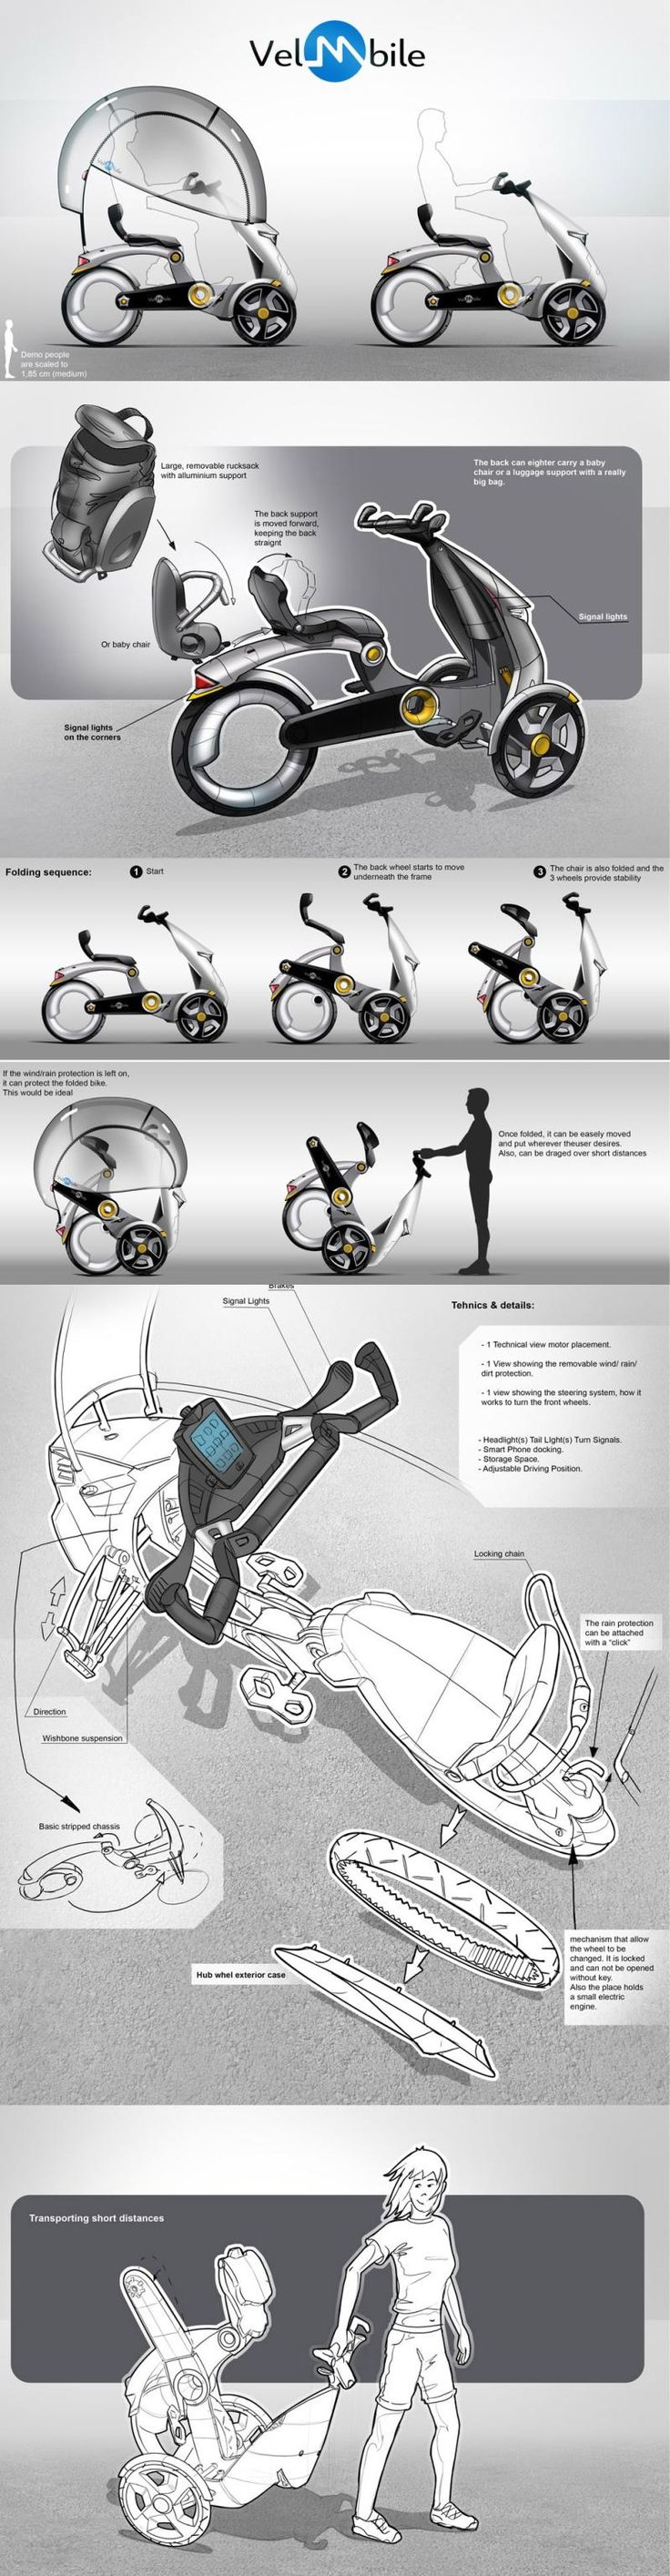 B'TWIN: velomobile concept designed Lucian Nicolae Acatrinei from Romania